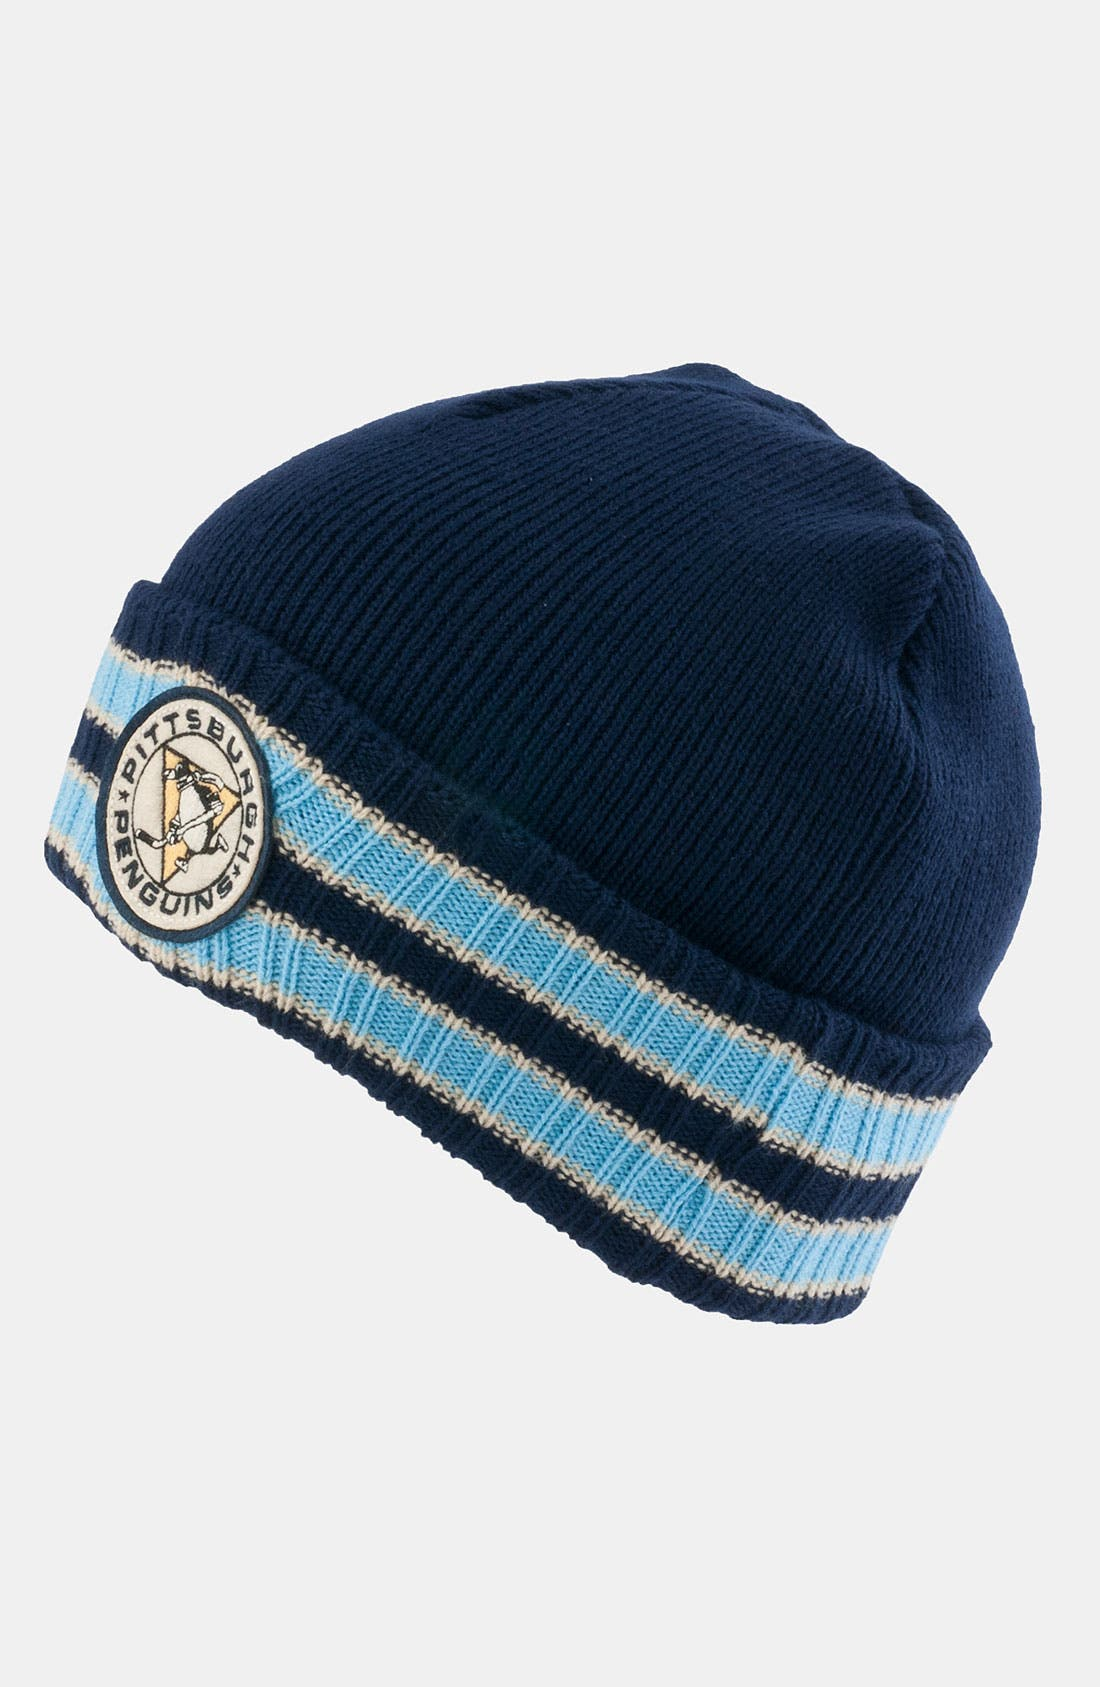 Alternate Image 1 Selected - American Needle 'Pittsburgh Penguins - Slash' Knit Hat